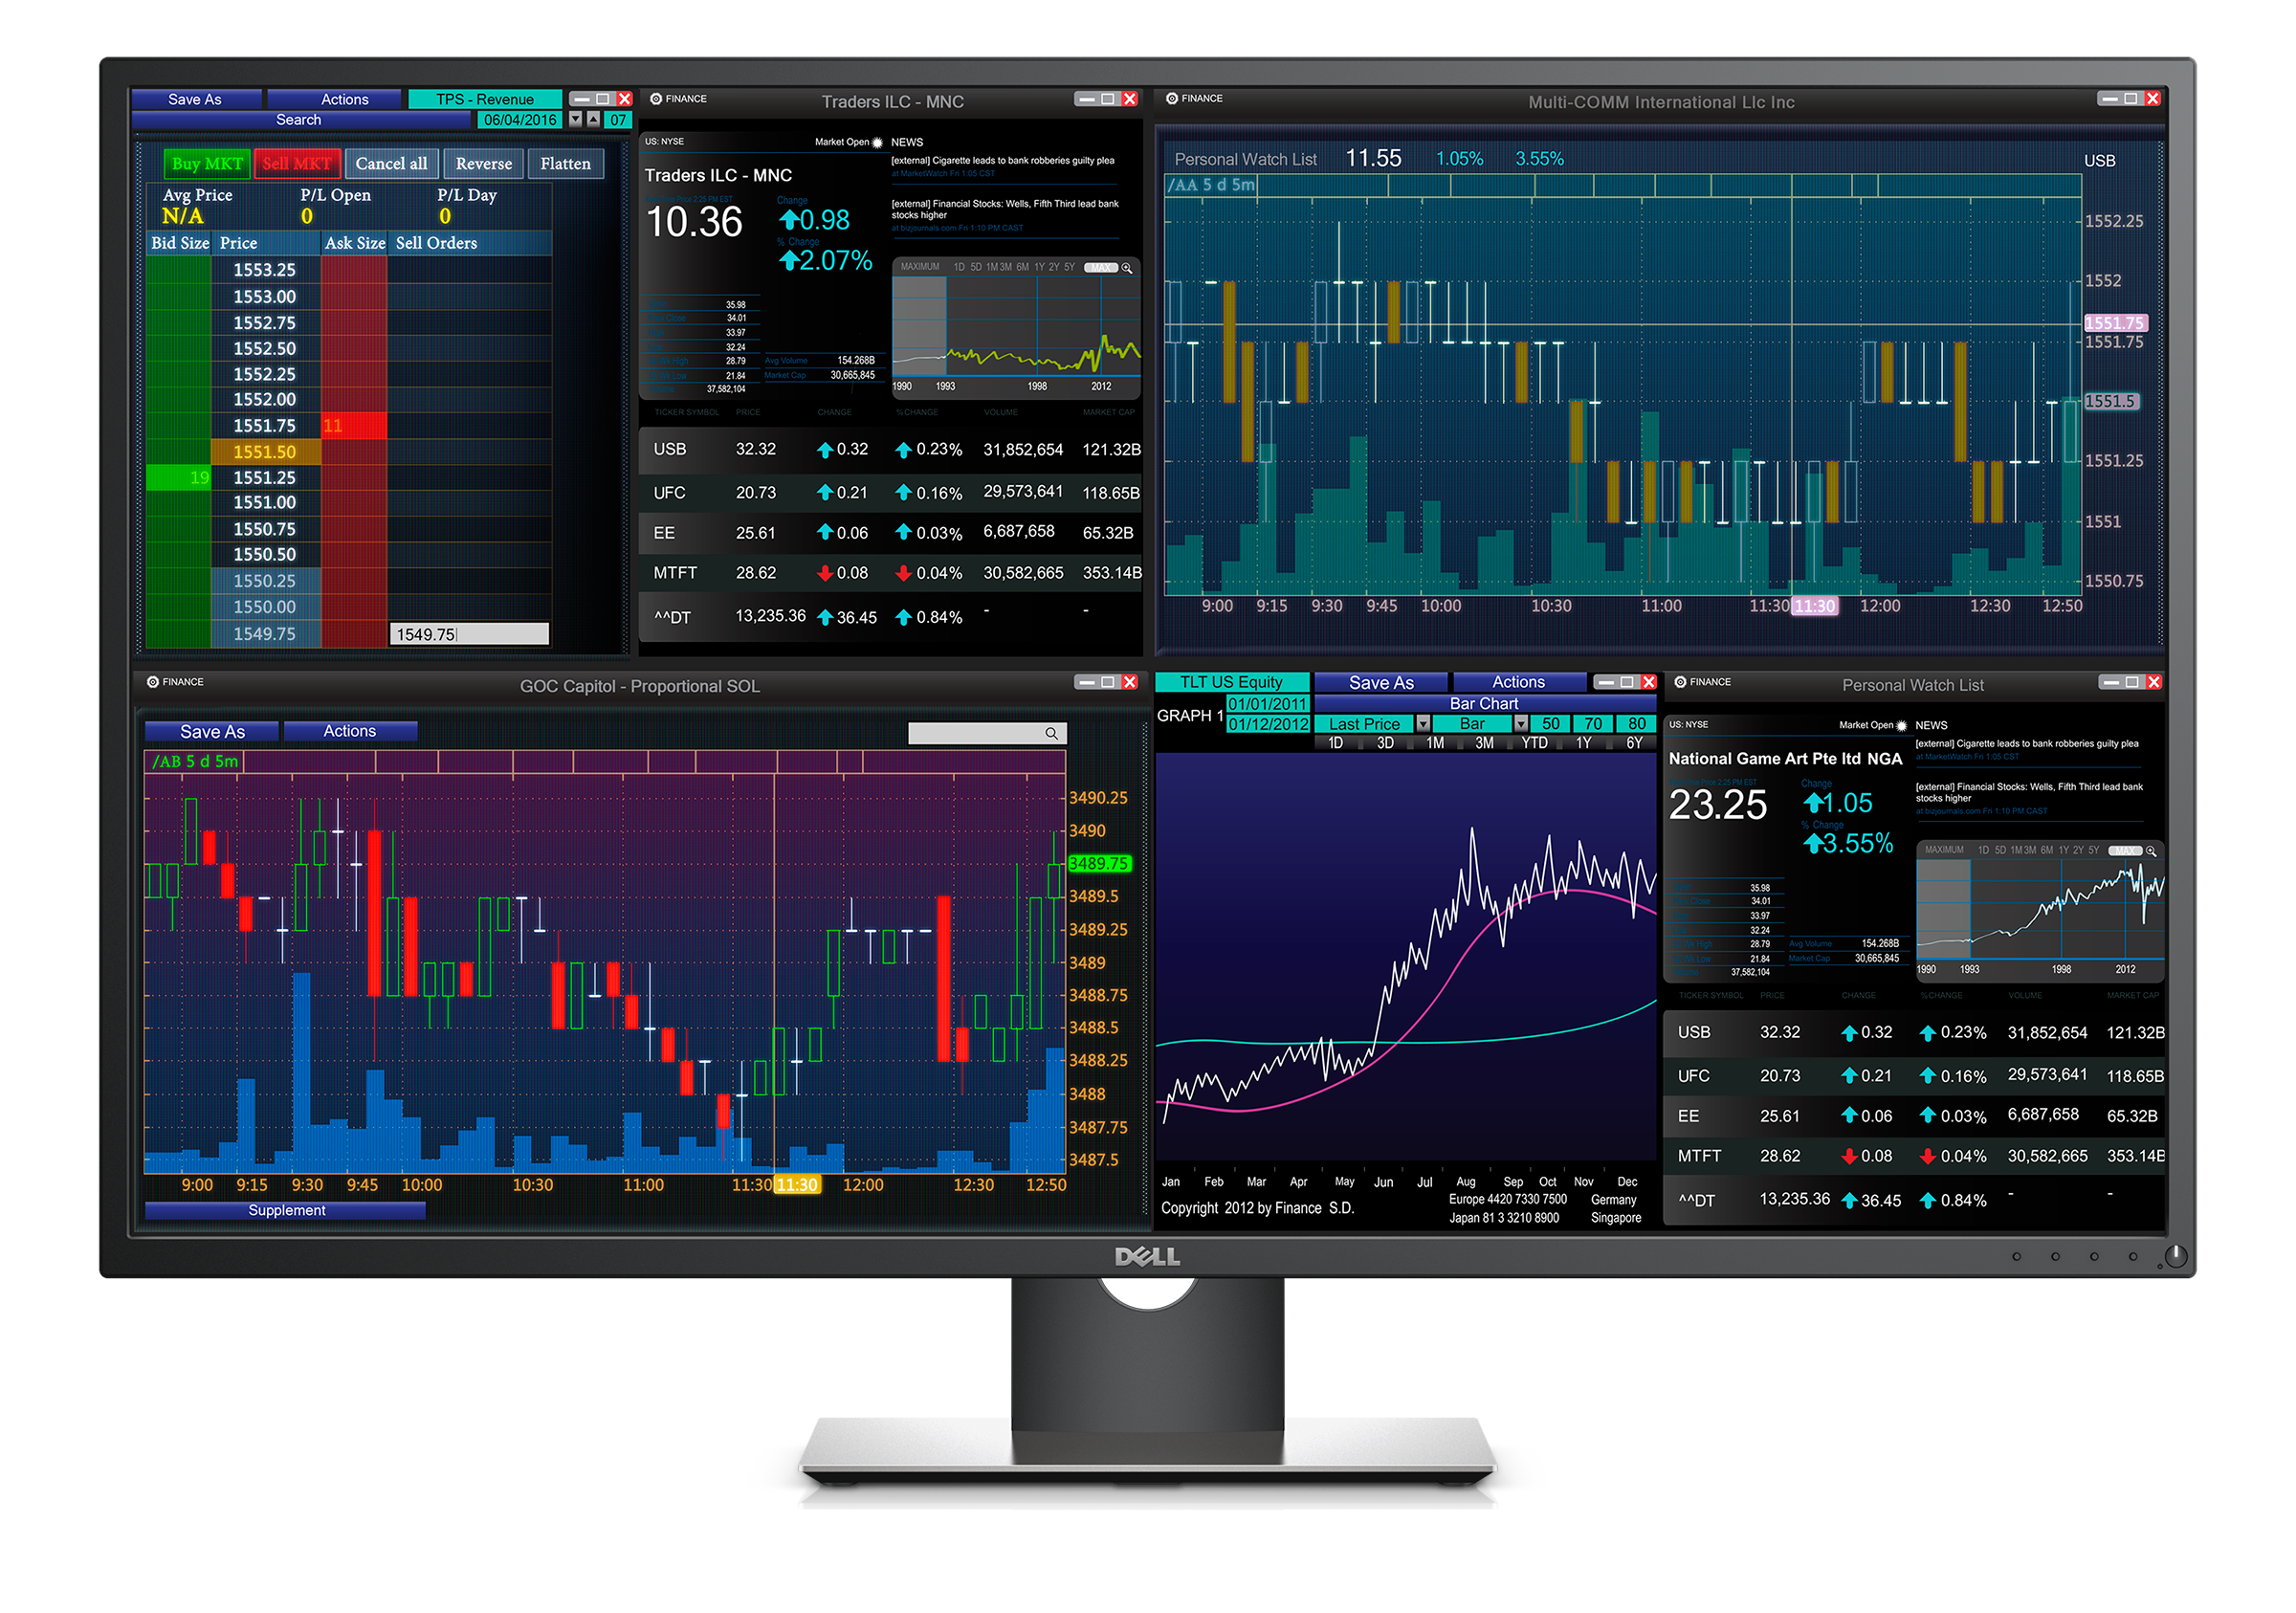 Dell monitor P4317Q_lfp_00000f90_gy_FillLG